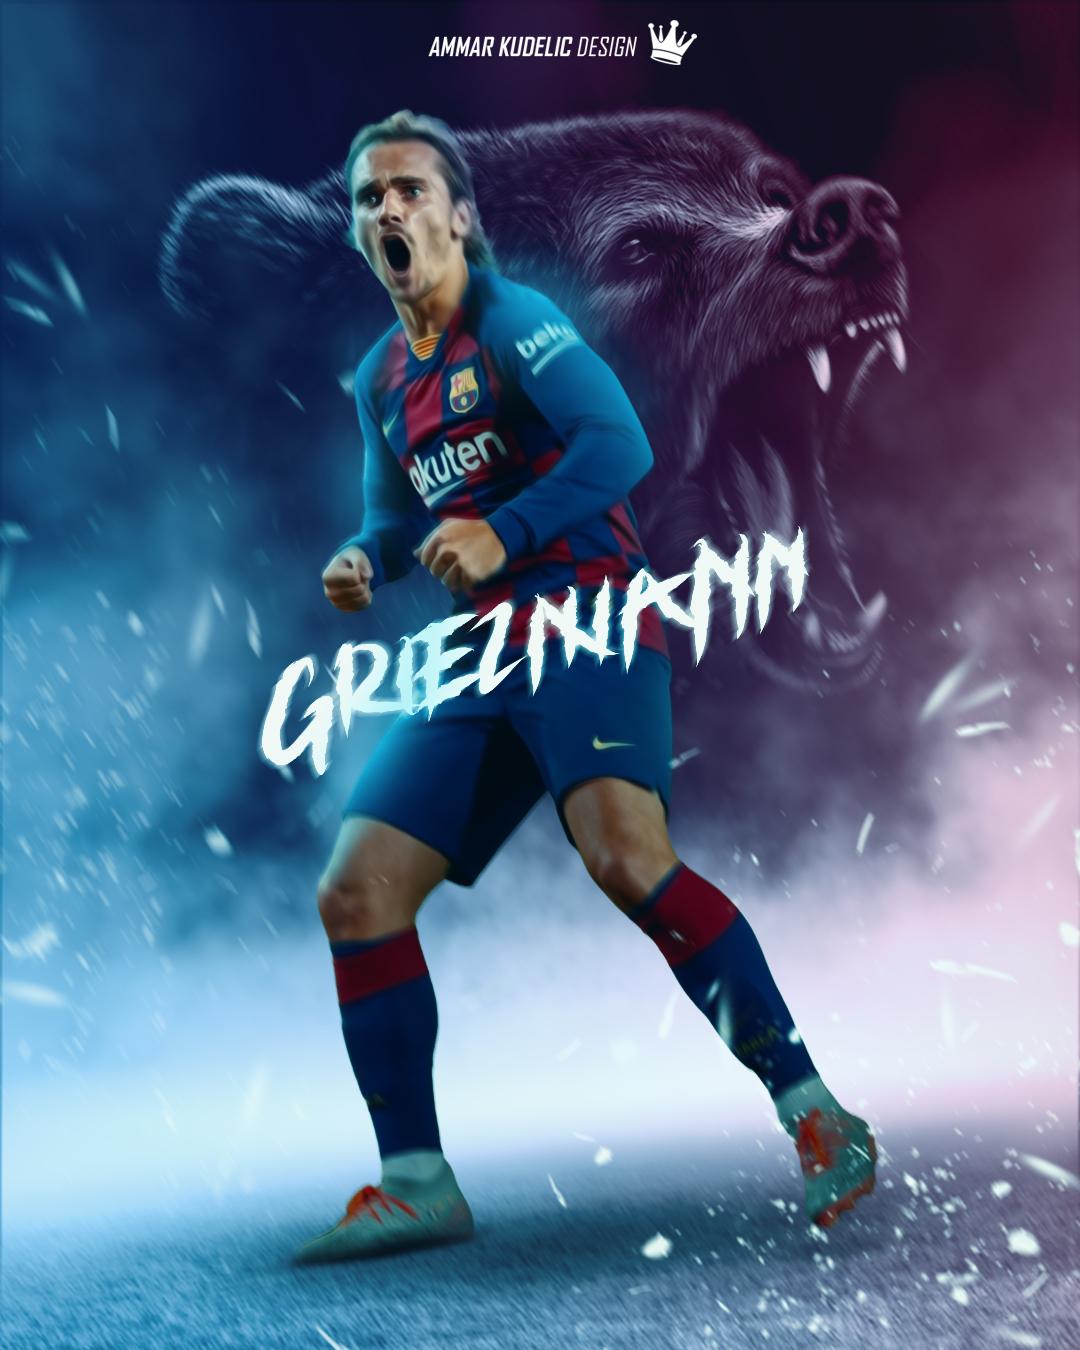 Griezmann Fc Barcelona 2019 20 Edit By Ammarkudelic Design On Deviantart